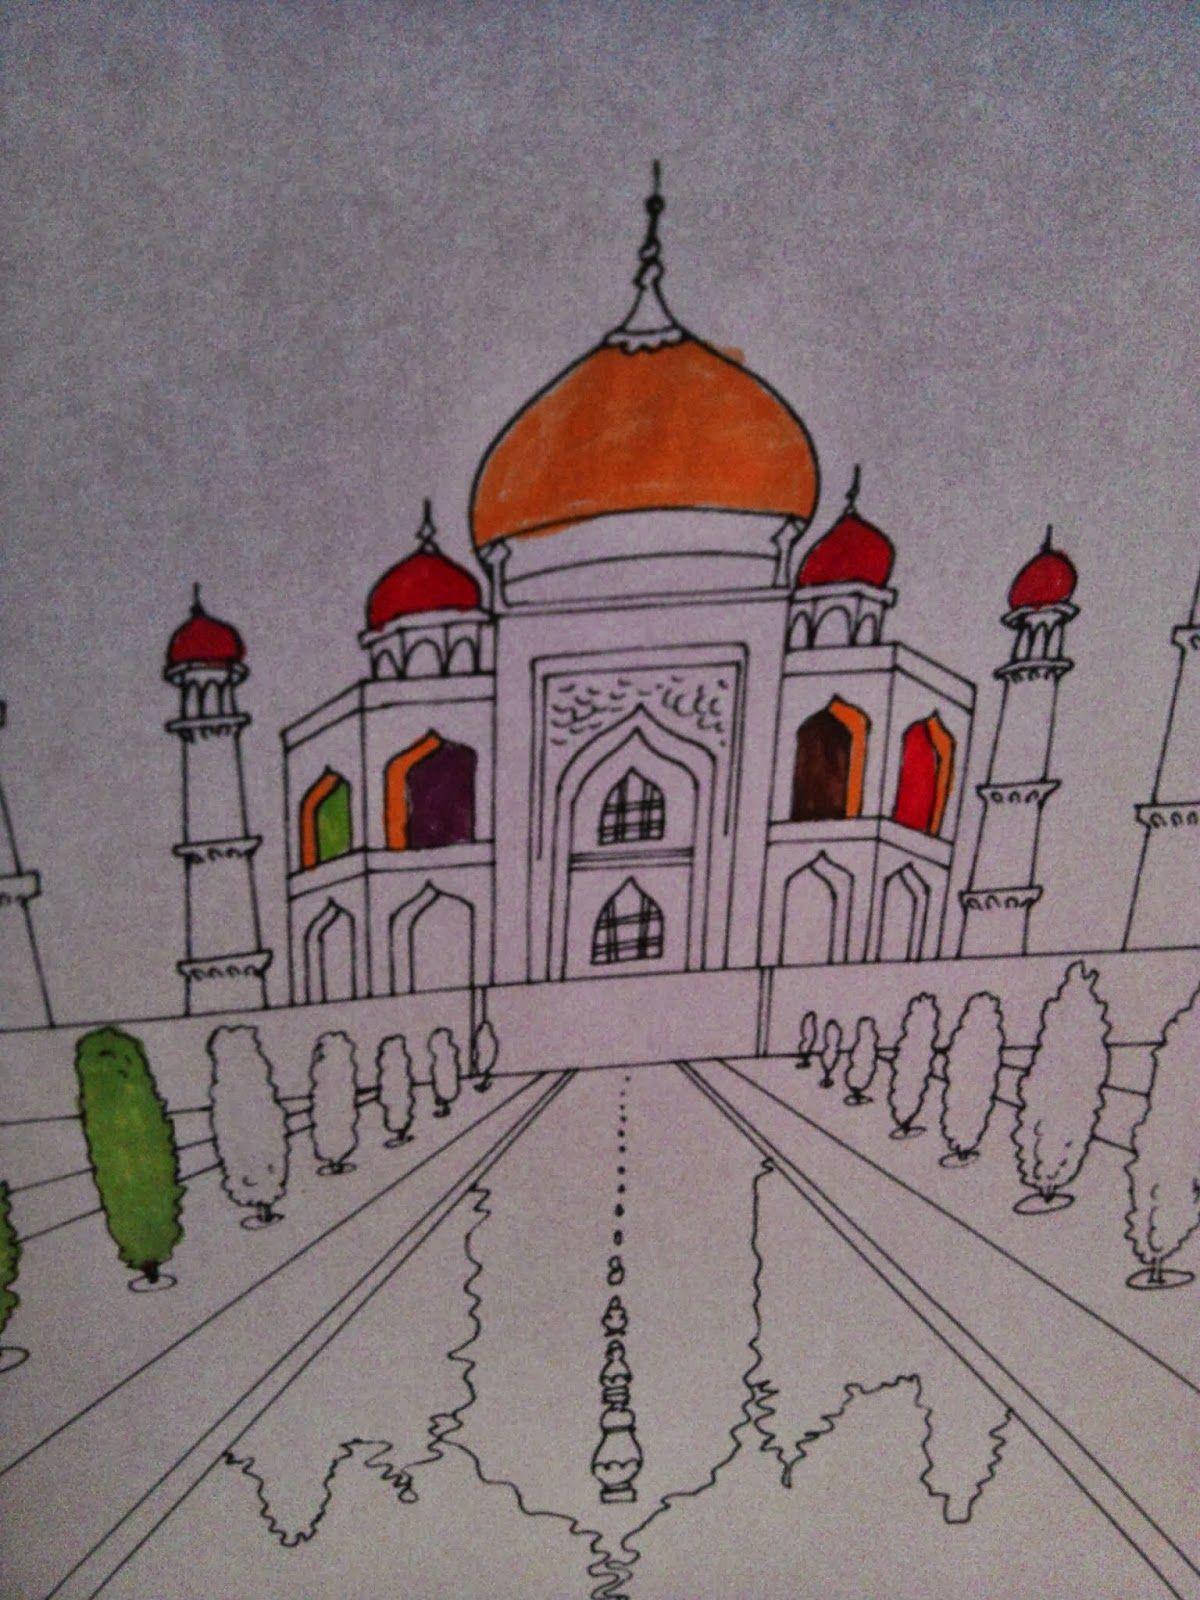 Inde coloriage l 39 inde inde voyage inde et coloriage - Coloriage inde ...